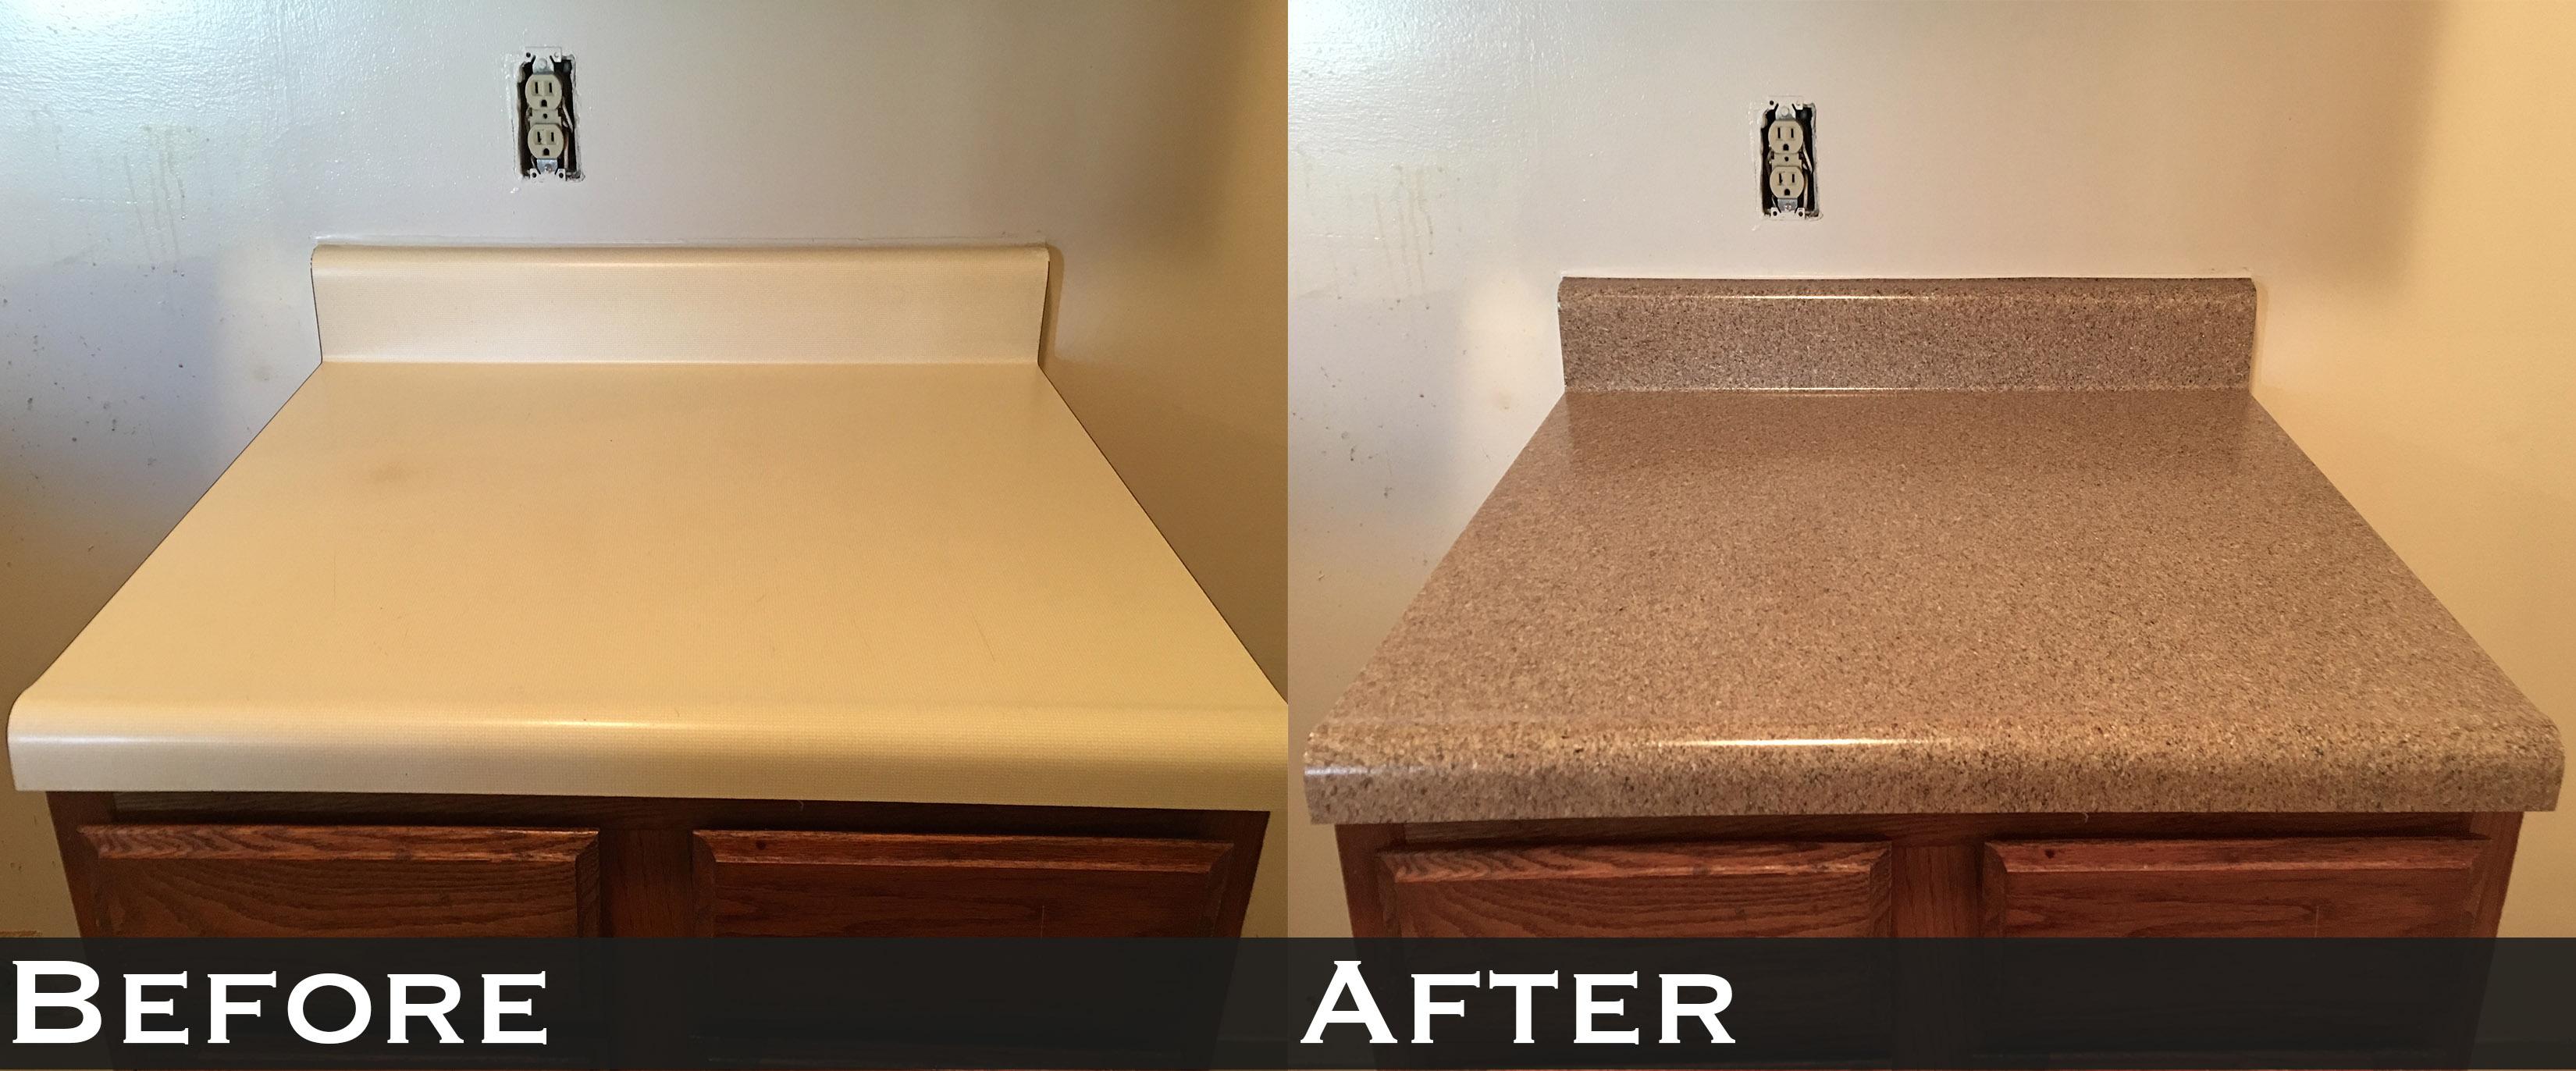 Kitchen Countertop Resurfacing   Quality Restoration